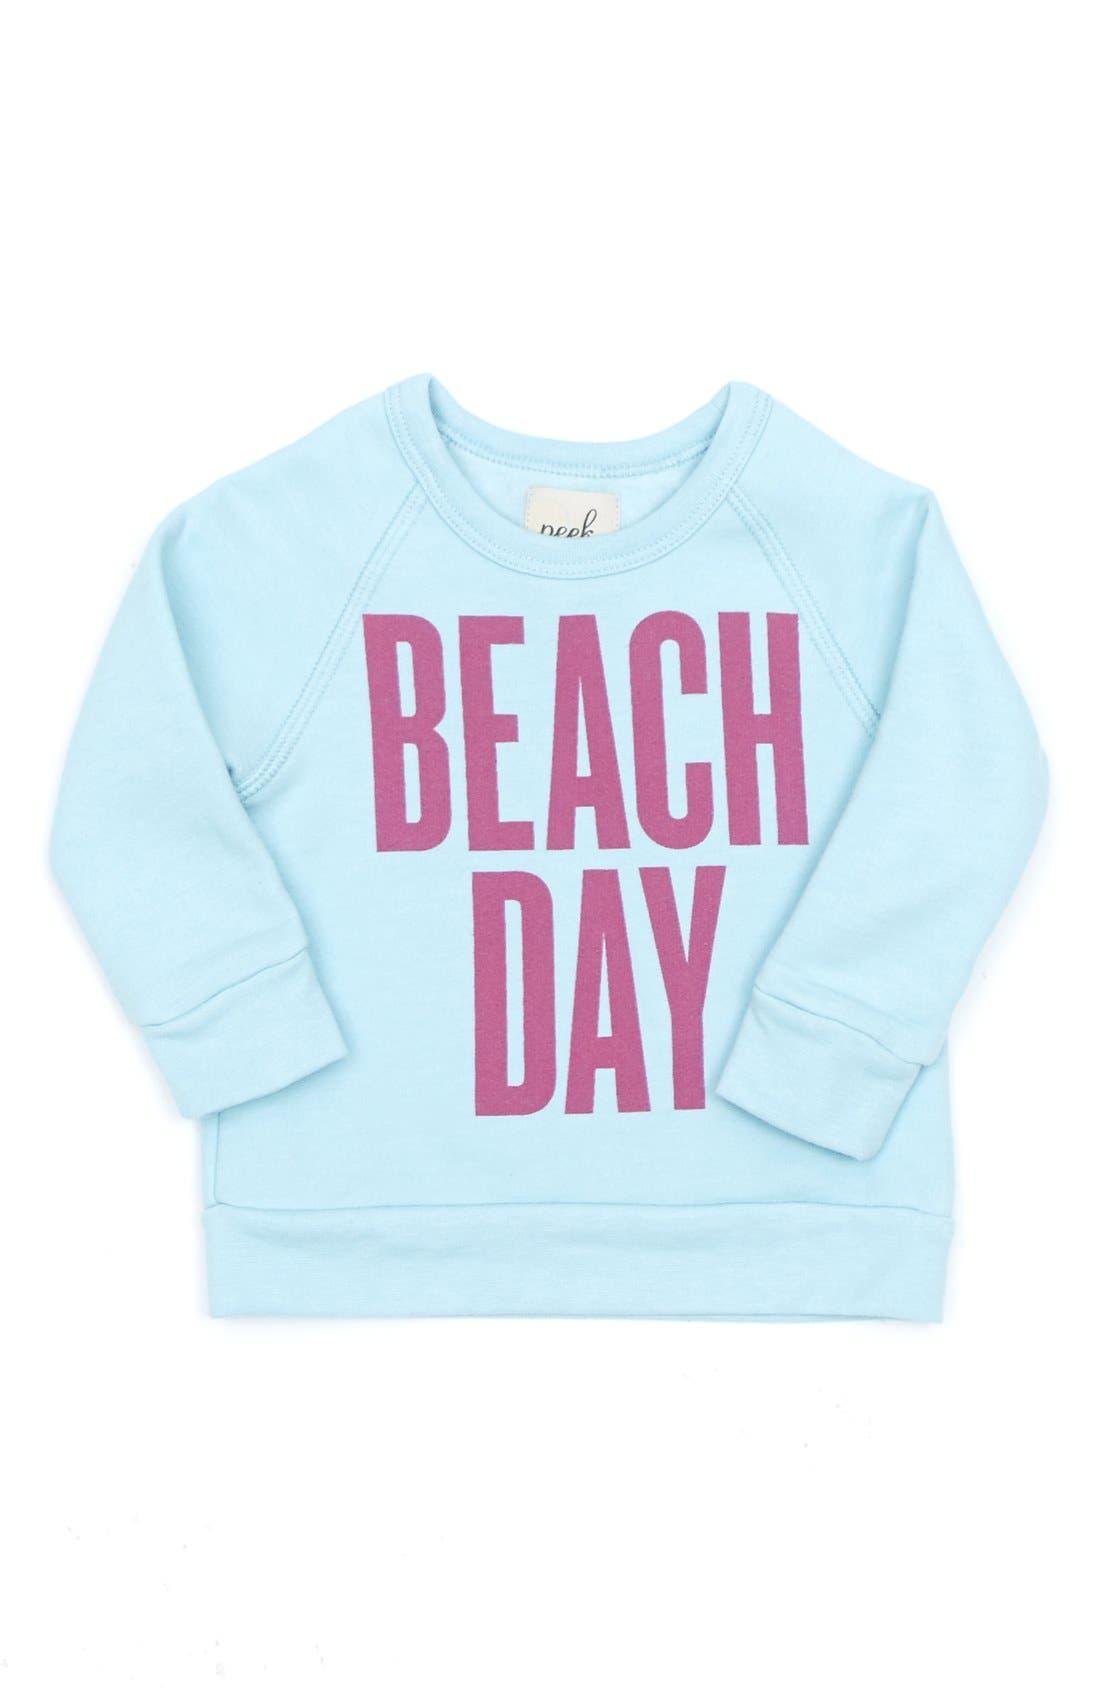 Main Image - Peek 'Beach Day' Crewneck Sweatshirt (Toddler Girls, Little Girls & Big Girls)